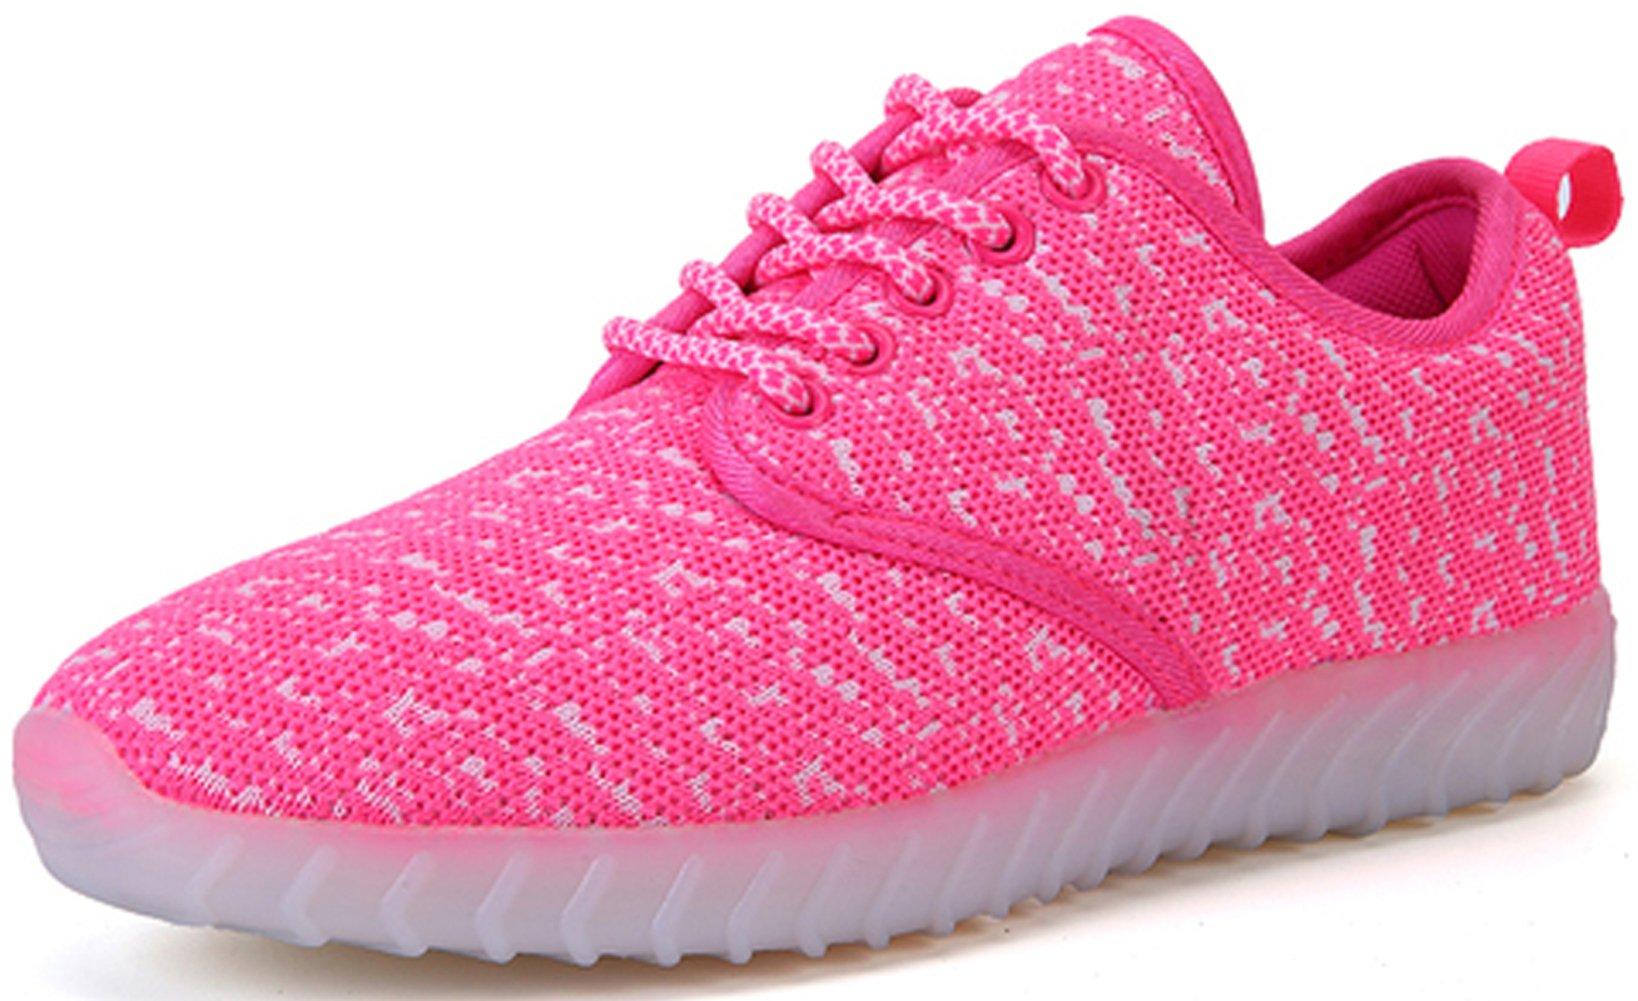 Joansam 7 Colors LED Luminous Unisex Sneakers Men & Women USB Charging Light Colorful Glowing Flashing Shoes Sport Shoes